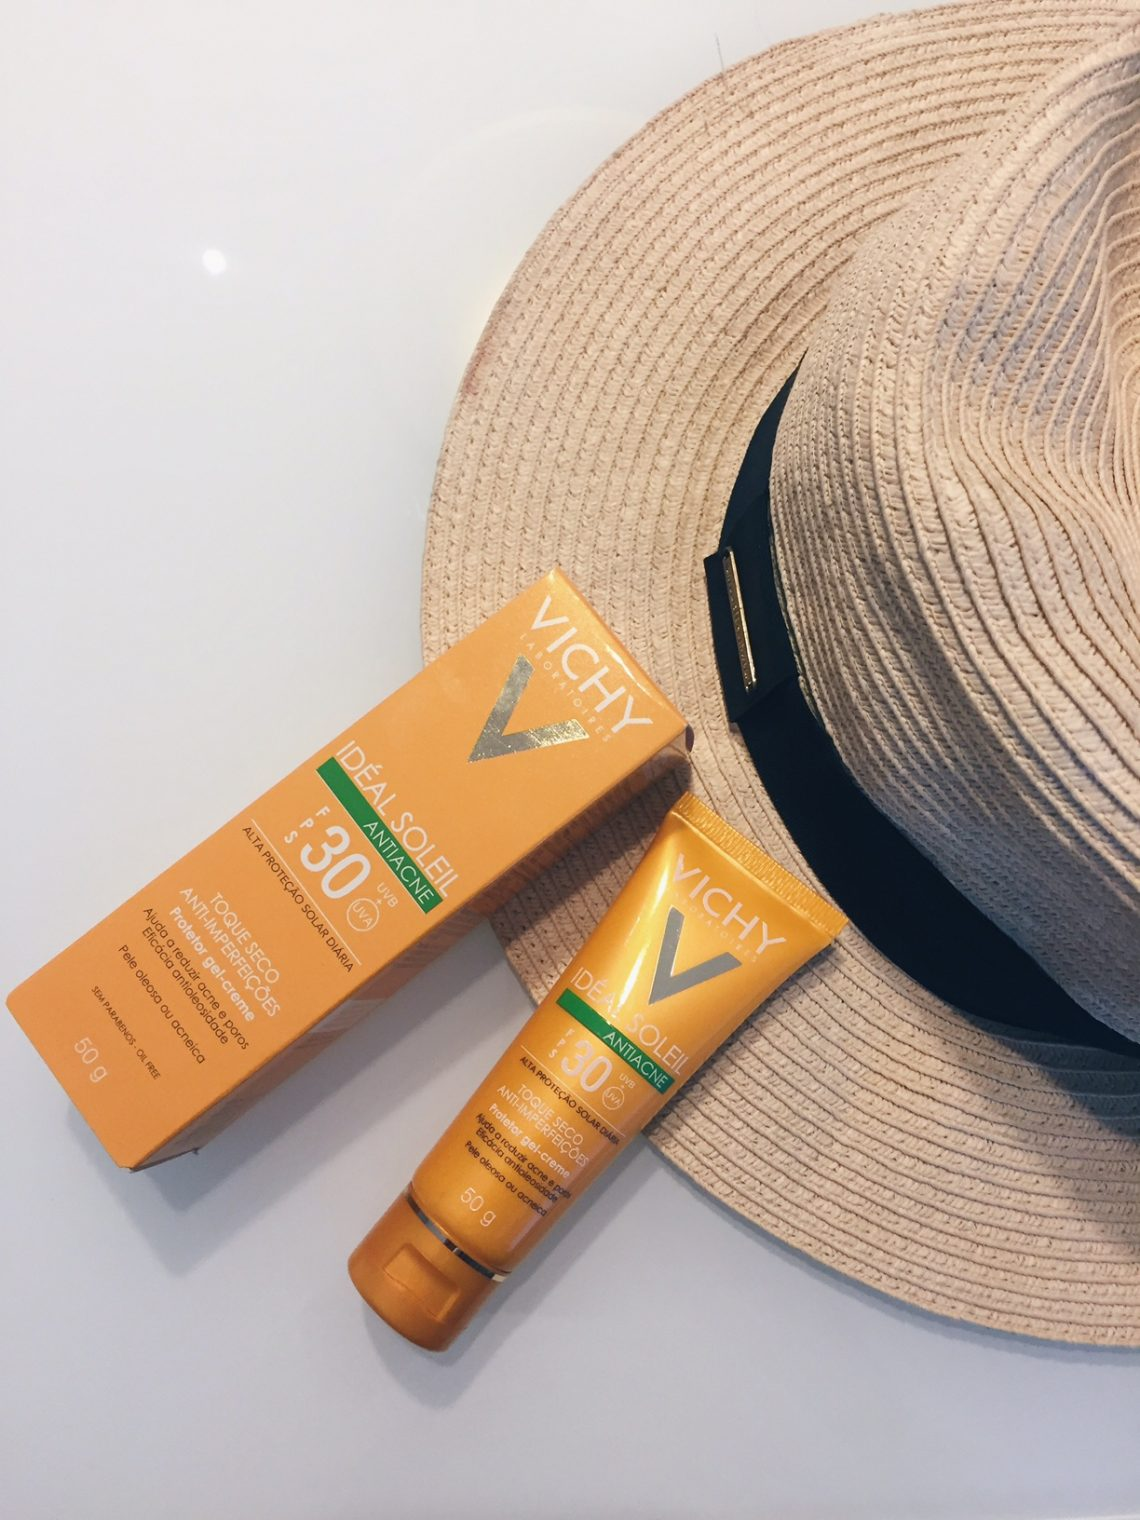 Protetor solar antiacne Vichy Idéal Soleil Antiacne